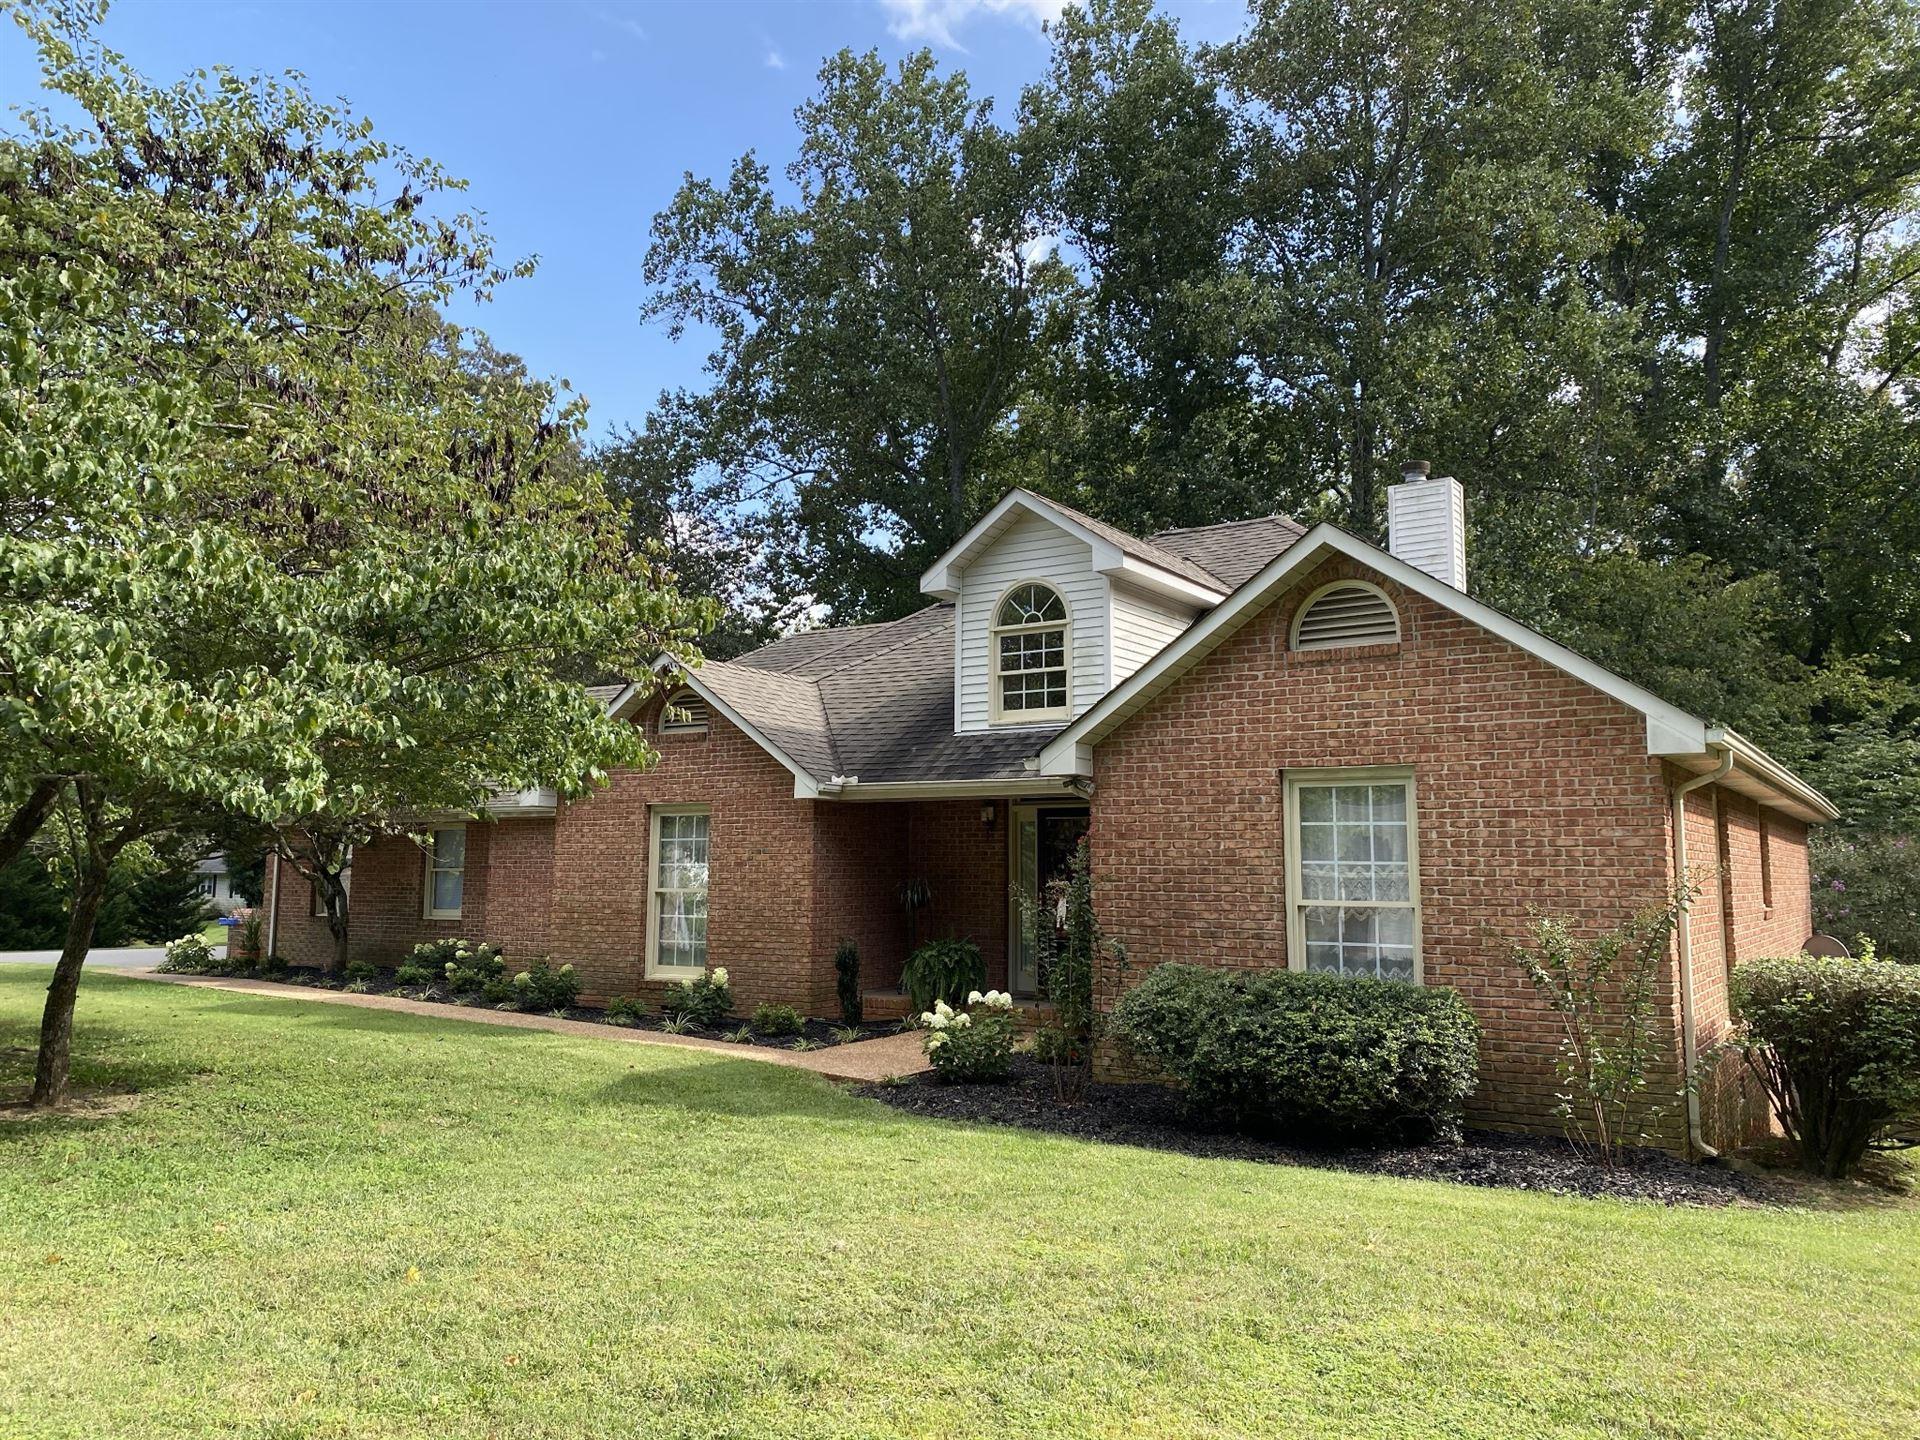 541 Ridgecrest Dr, McMinnville, TN 37110 - MLS#: 2188186